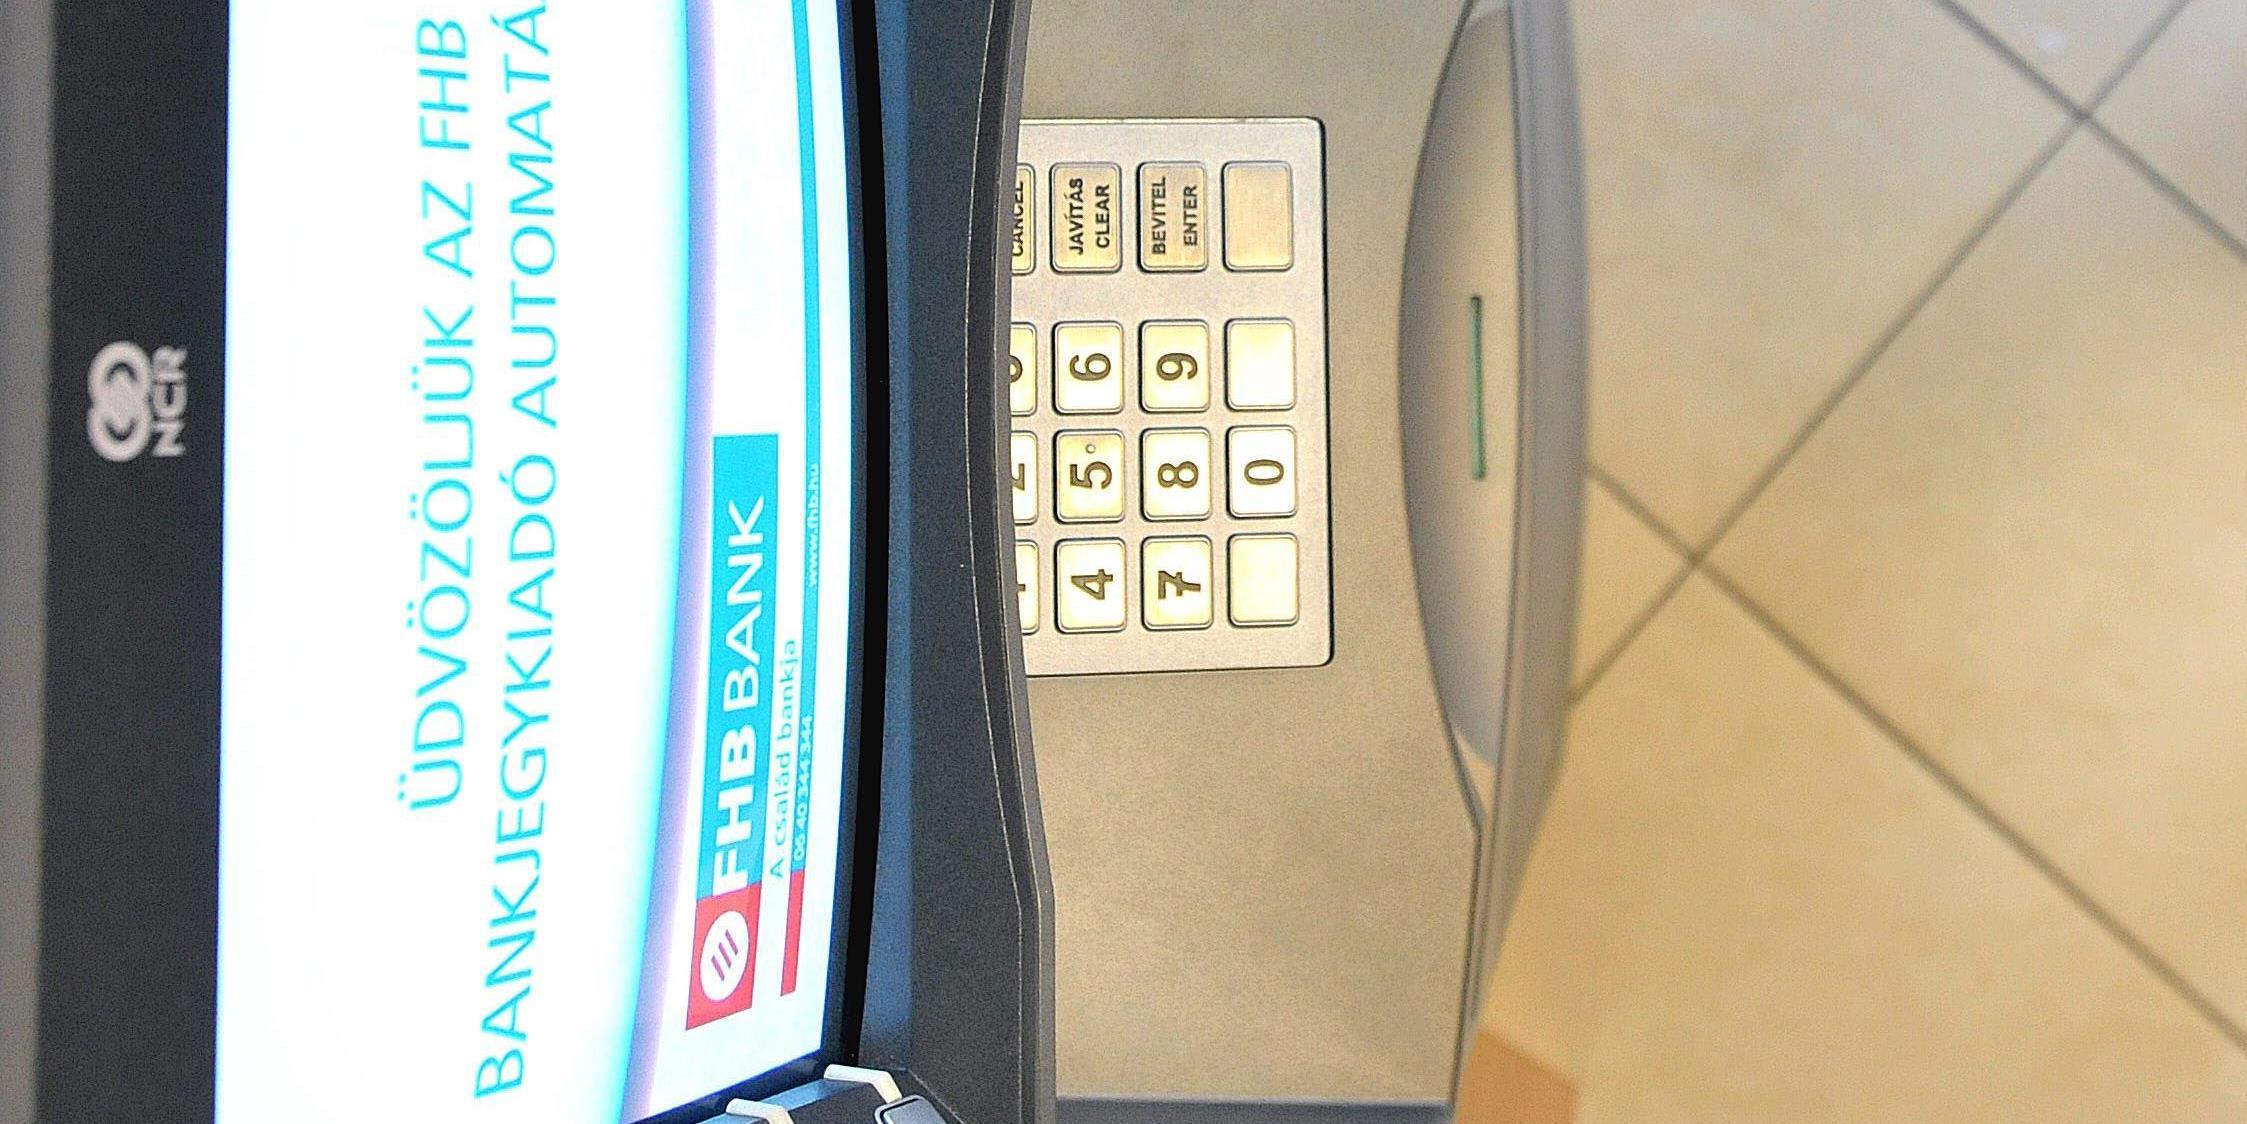 20151228fhb-bank-fhb-bank-bankautomata2